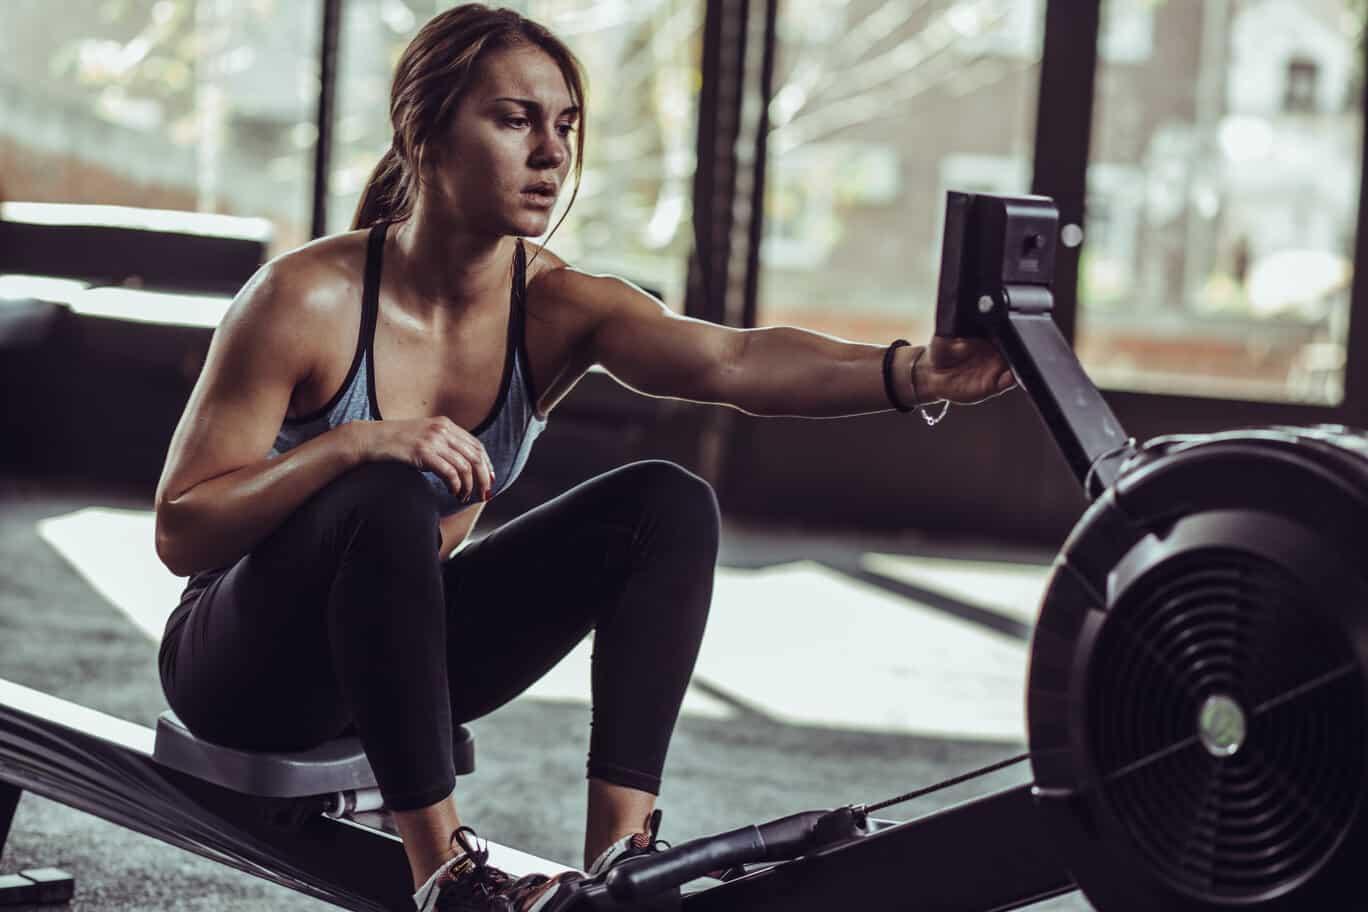 Rowing Machine Woman